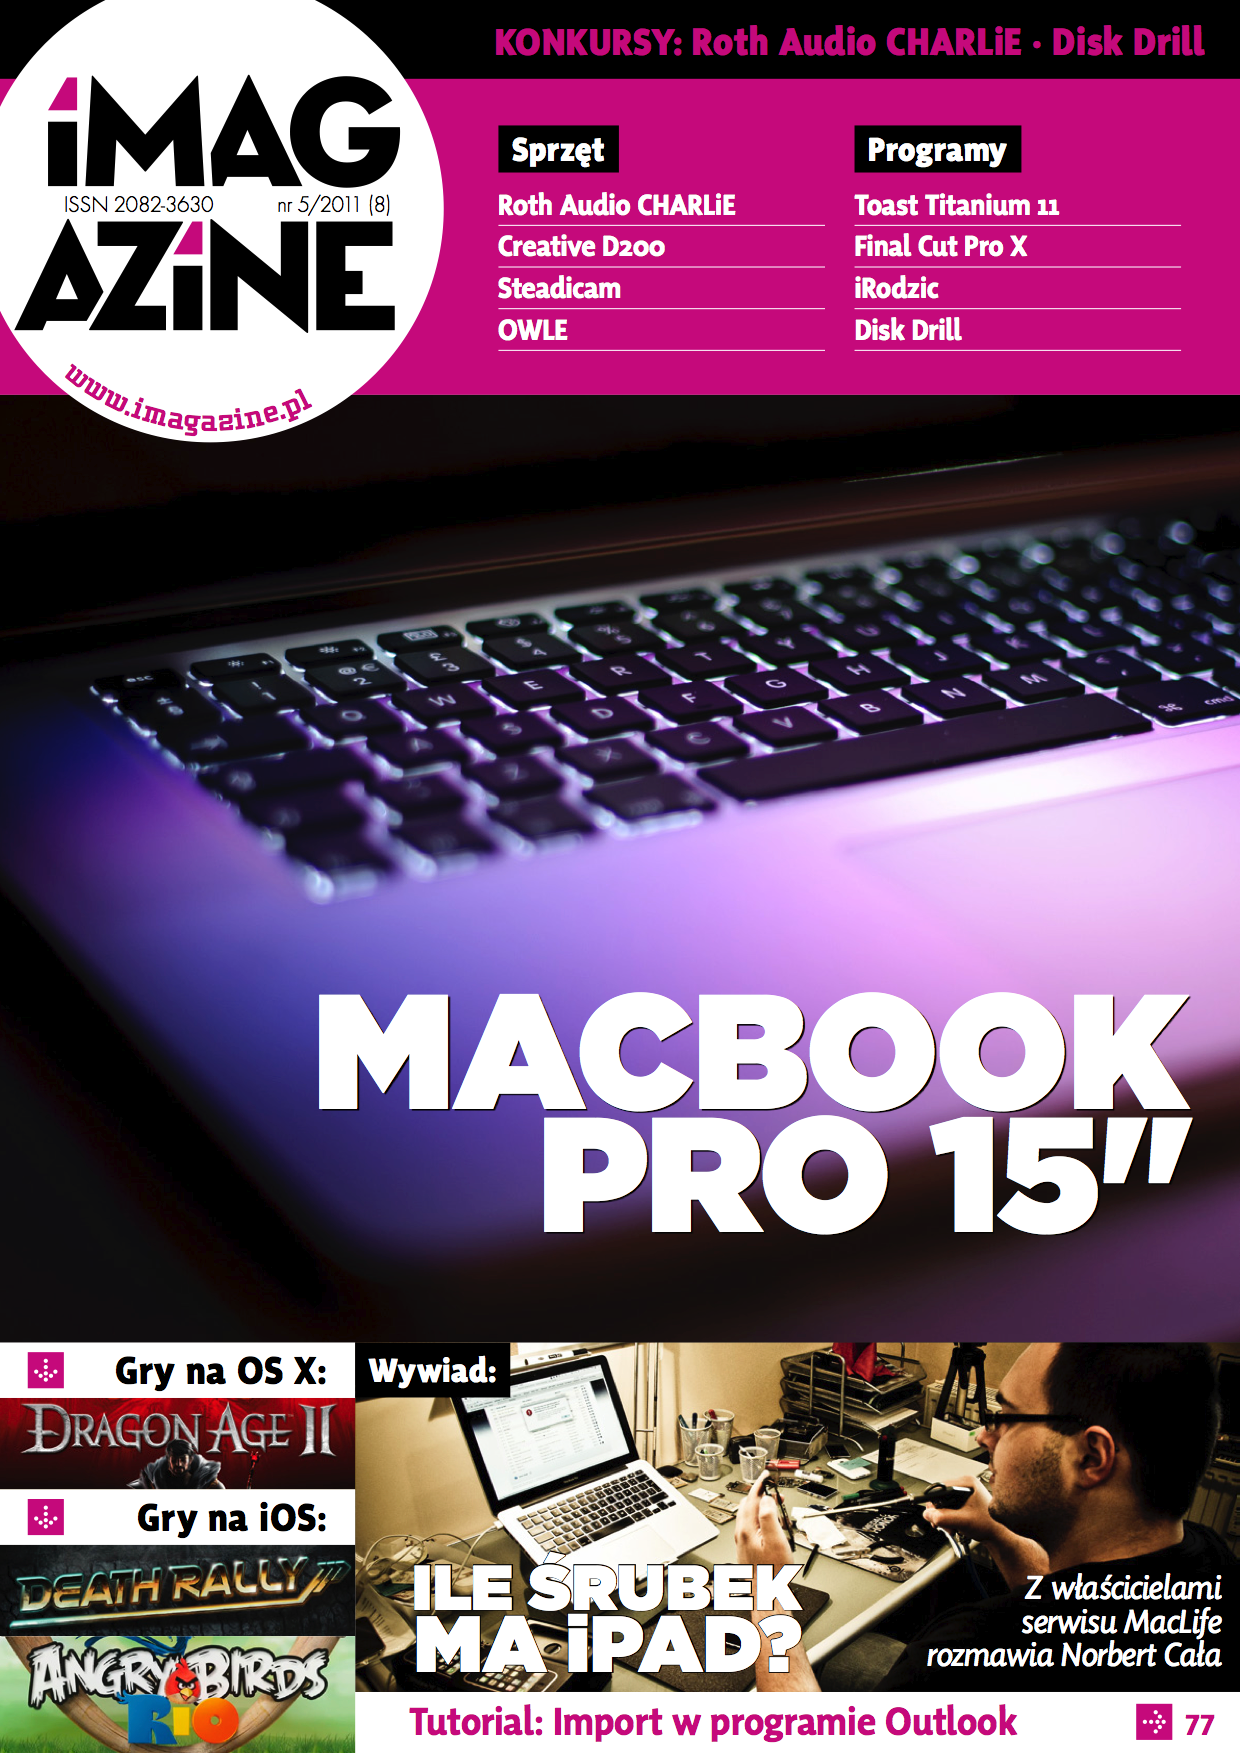 iMagazine 5/2011 – Macbook Pro 15″, Charlie, LEGO, Dragon Age II